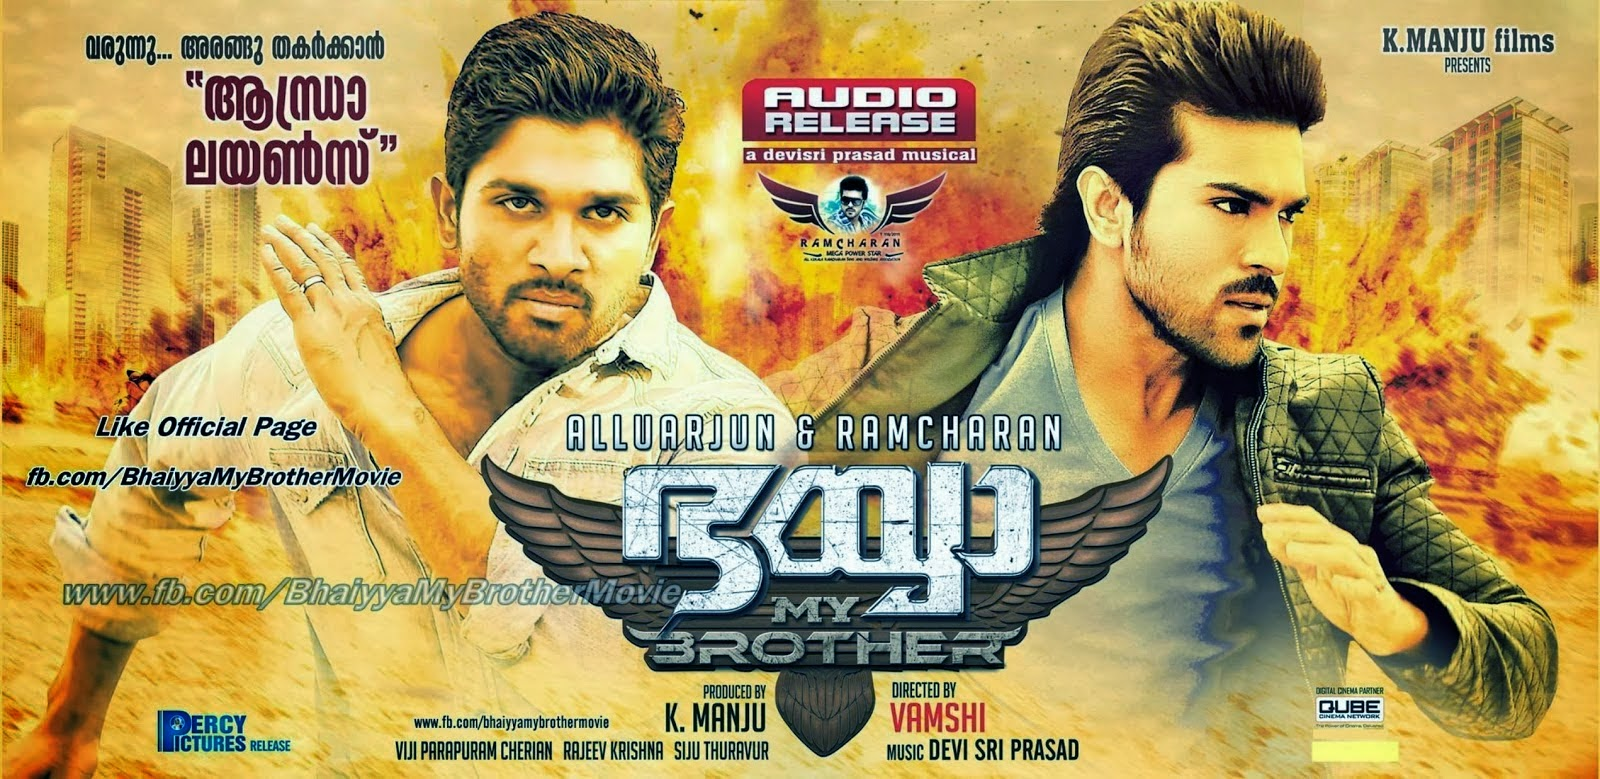 Allu Arjun Hindi Movie Dailymotion - ▷ ▷ PowerMall